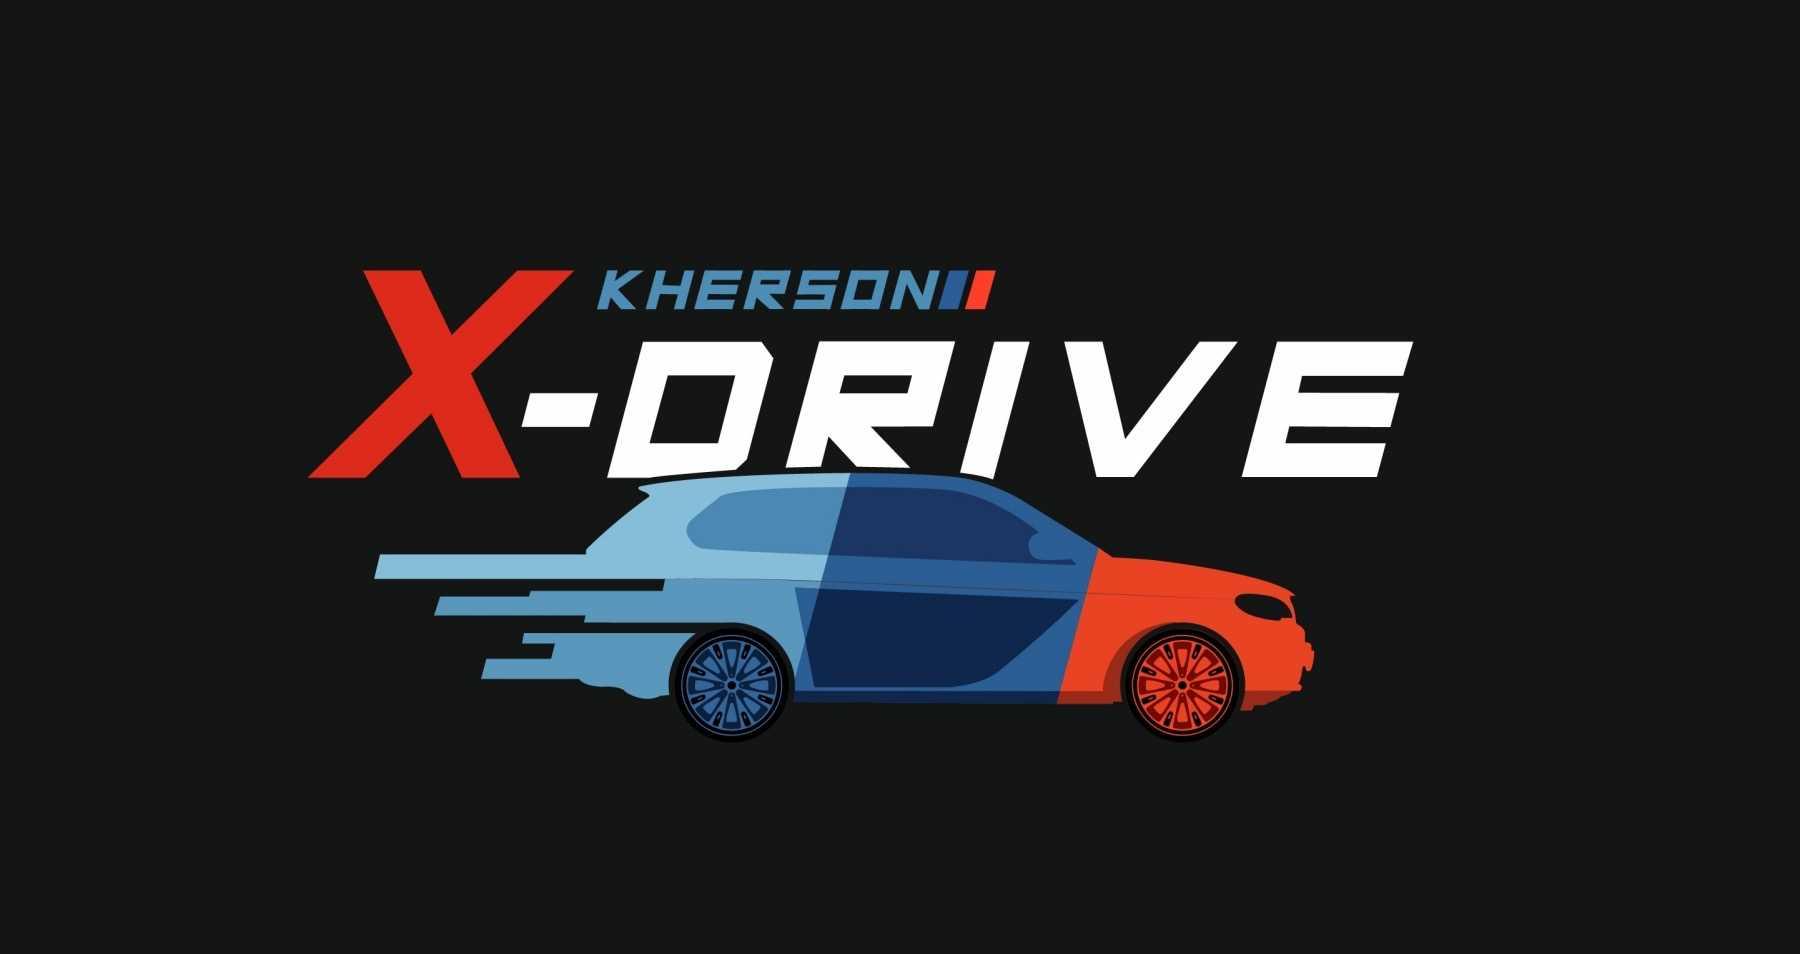 X-DRIVE KHERSON, вулиця Українська, 79, Херсон, Херсонська область, 73013, Херсон